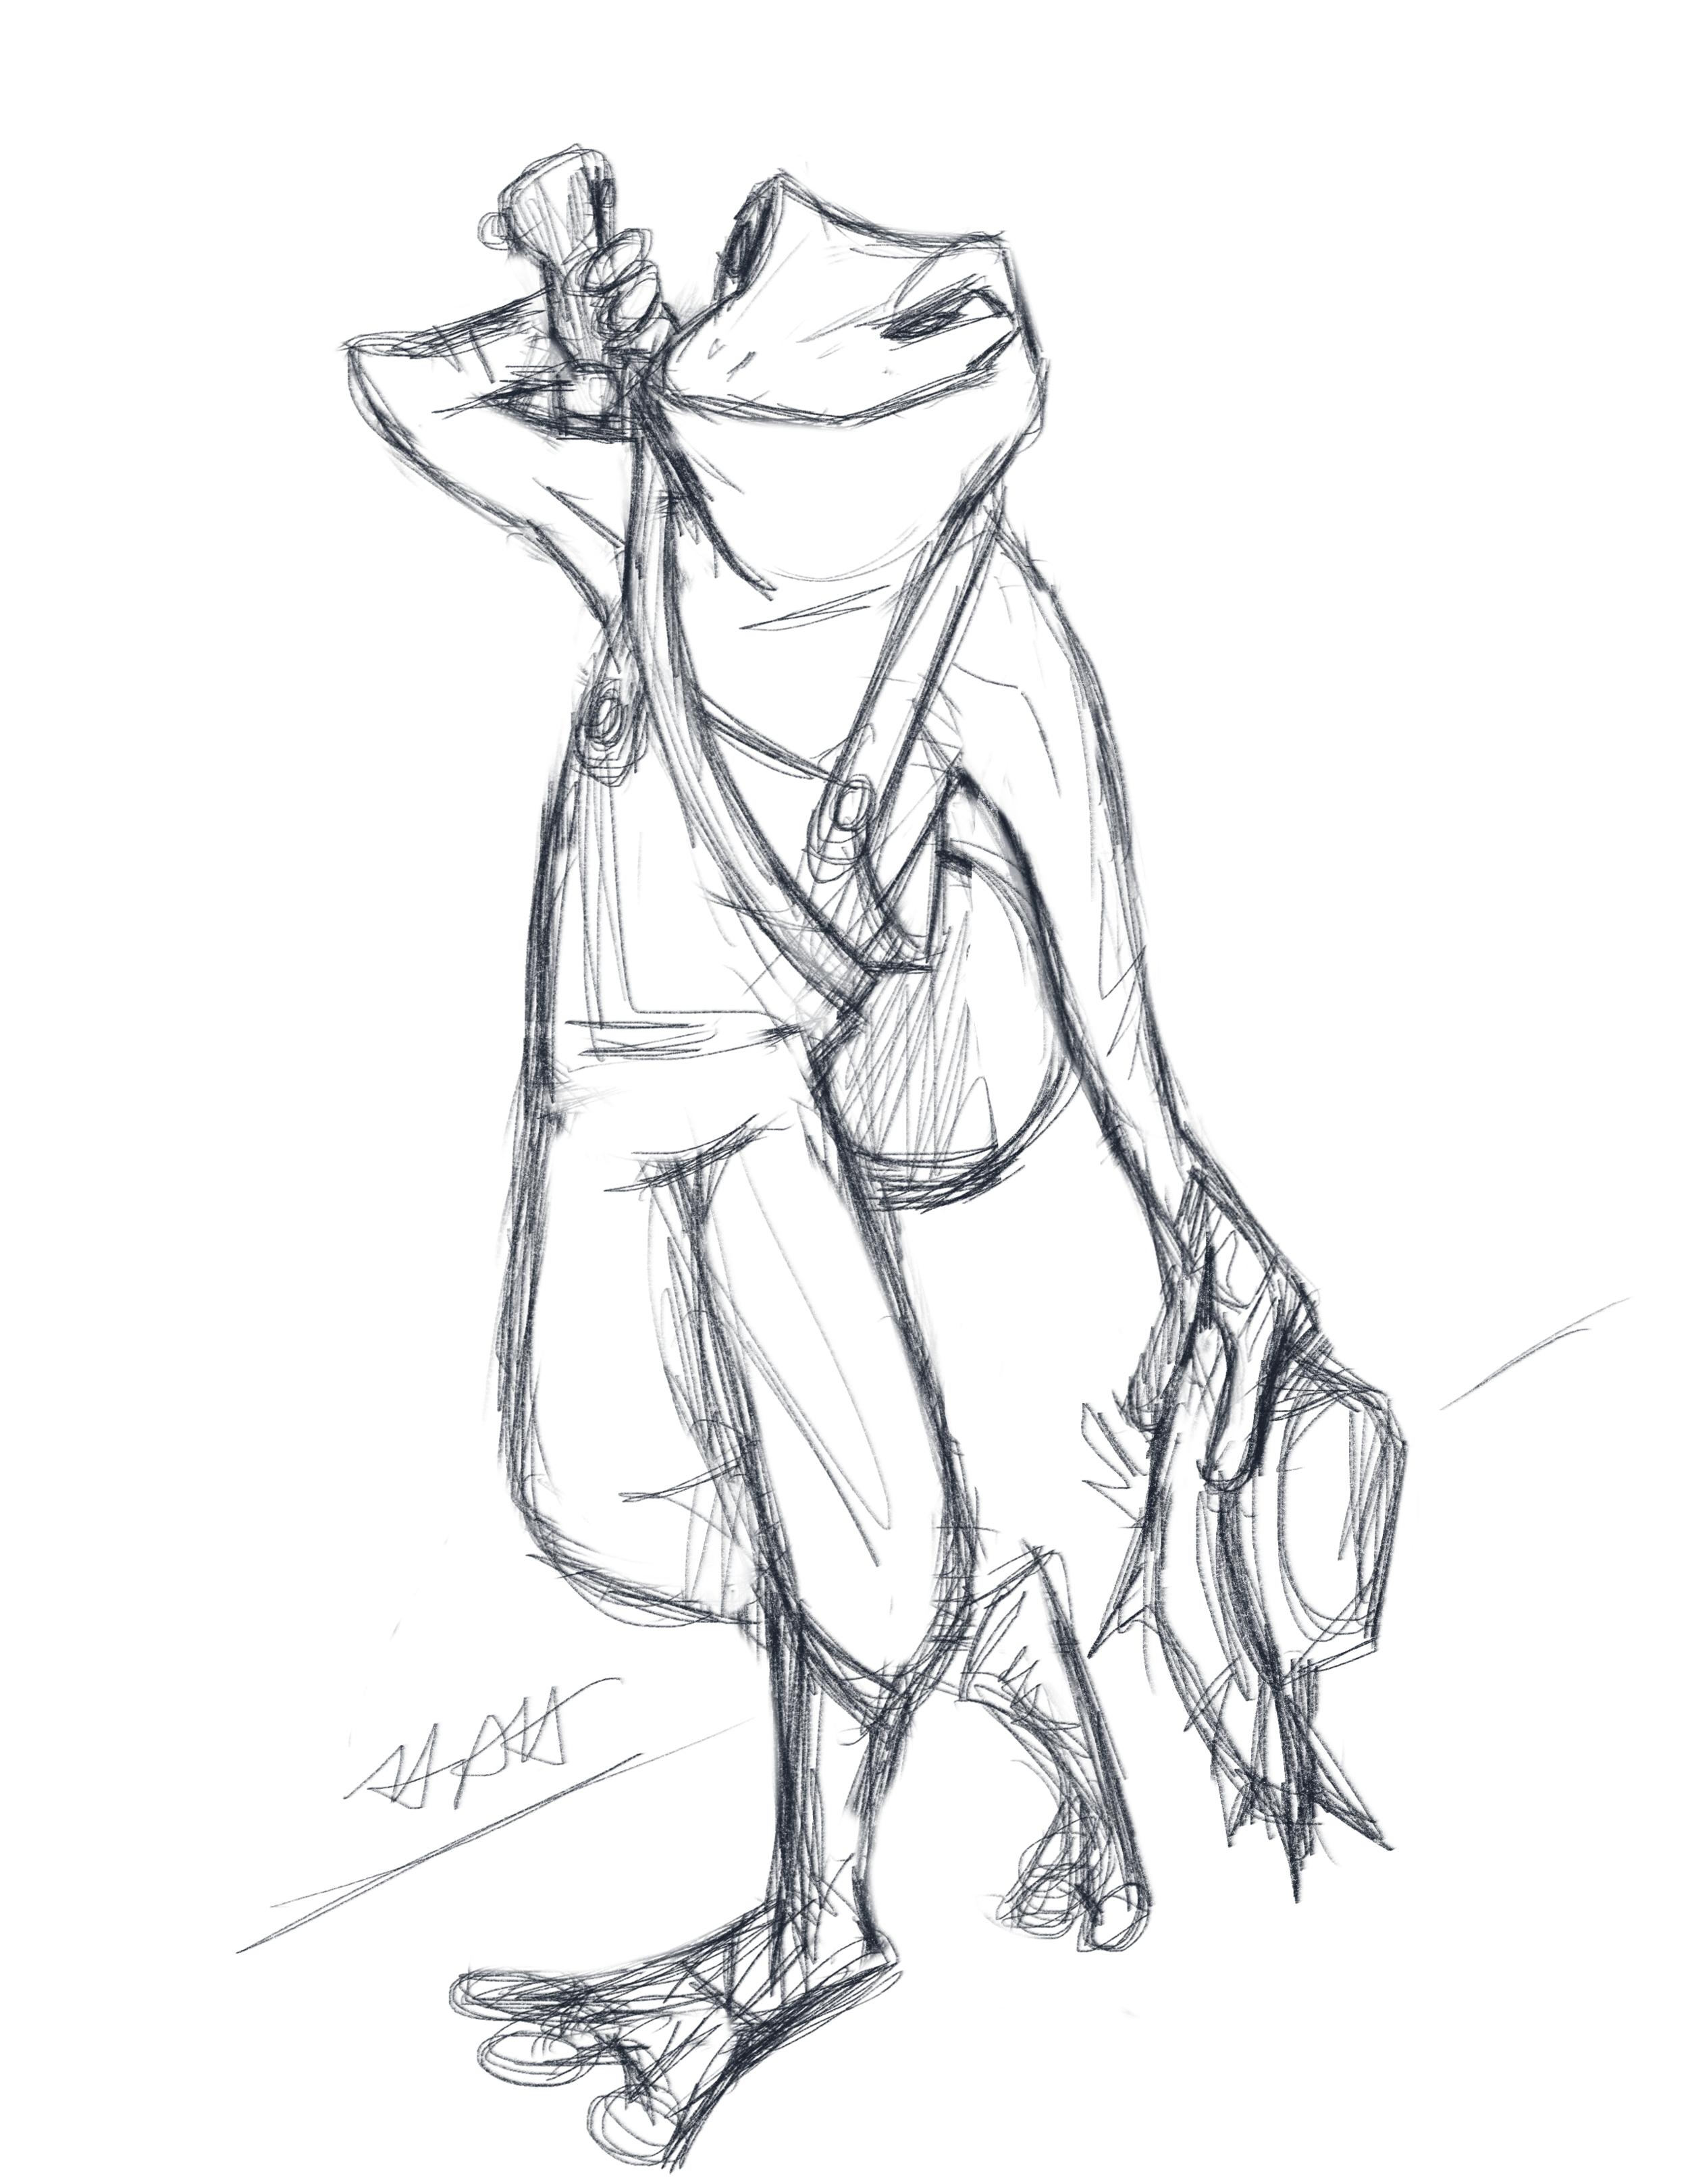 Grippli Character Design Sketch commission